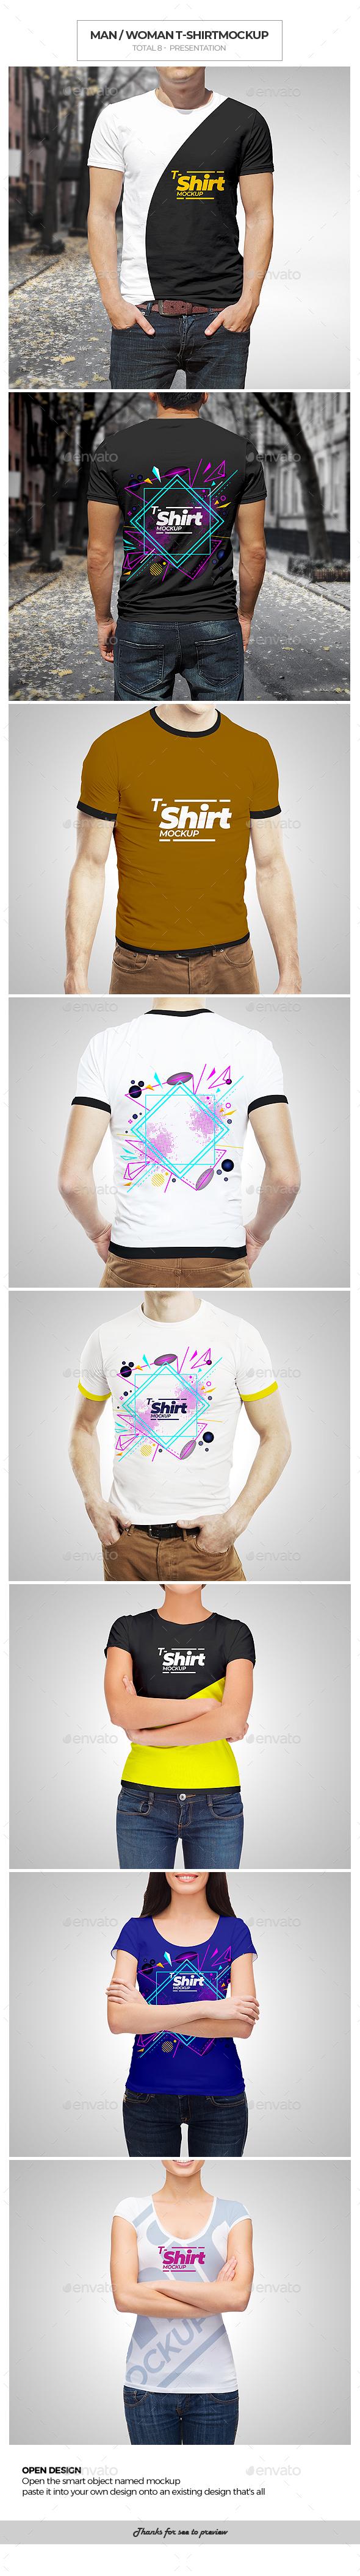 Man / Woman T-shirt Mockup - T-shirts Apparel